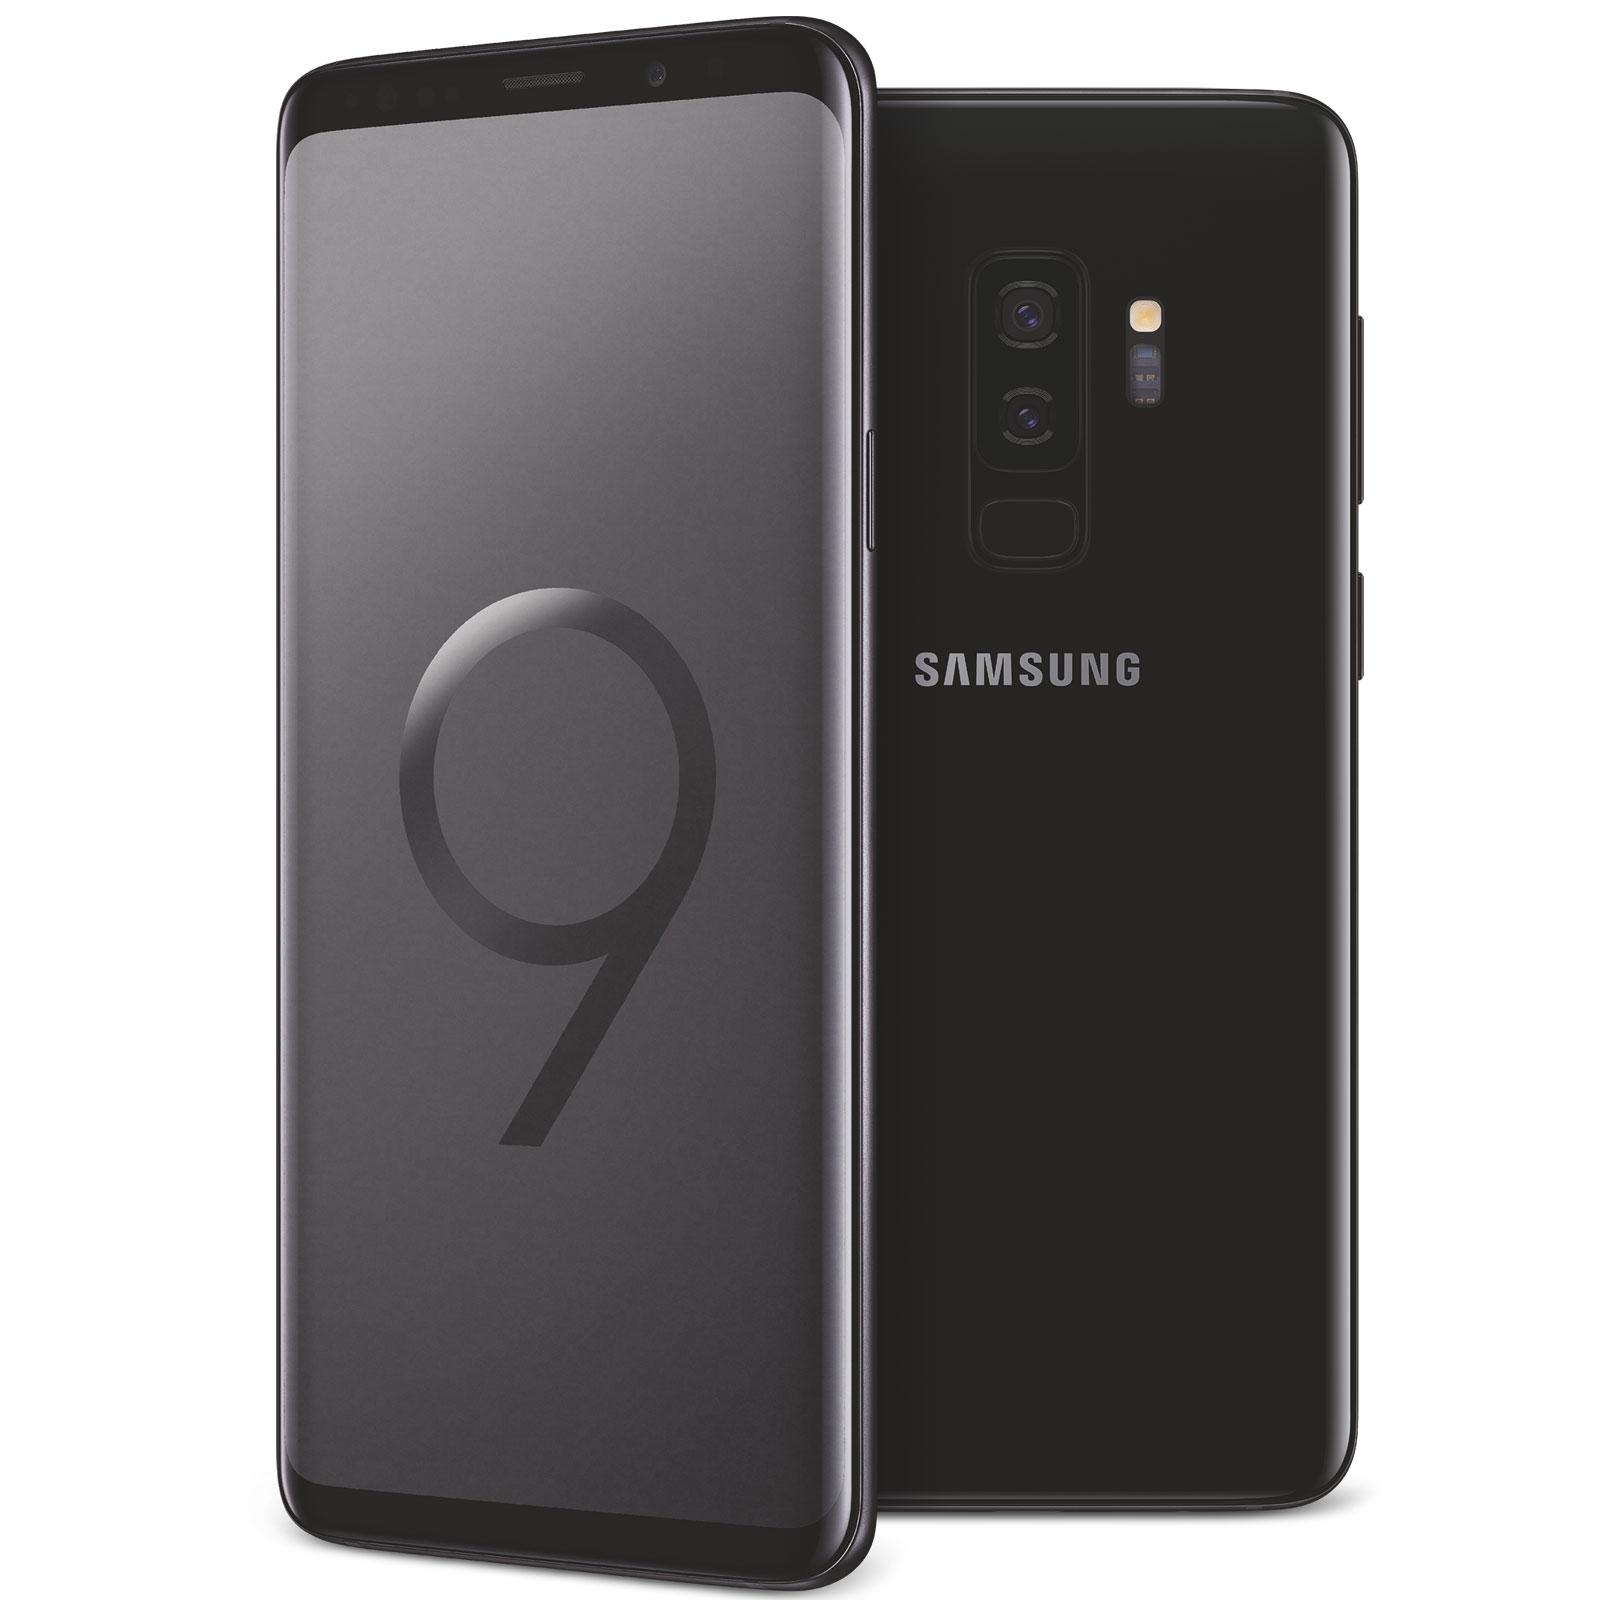 "Mobile & smartphone Samsung Galaxy S9+ SM-G965F Noir Carbone 64 Go Smartphone 4G-LTE Advanced Dual SIM IP68 - Exynos 9810 8-Core 2.7 GHz - RAM 6 Go - Ecran tactile 6.2"" 1440 x 2960 - 64 Go - NFC/Bluetooth 5.0 - 3500 mAh - Android 8.0"